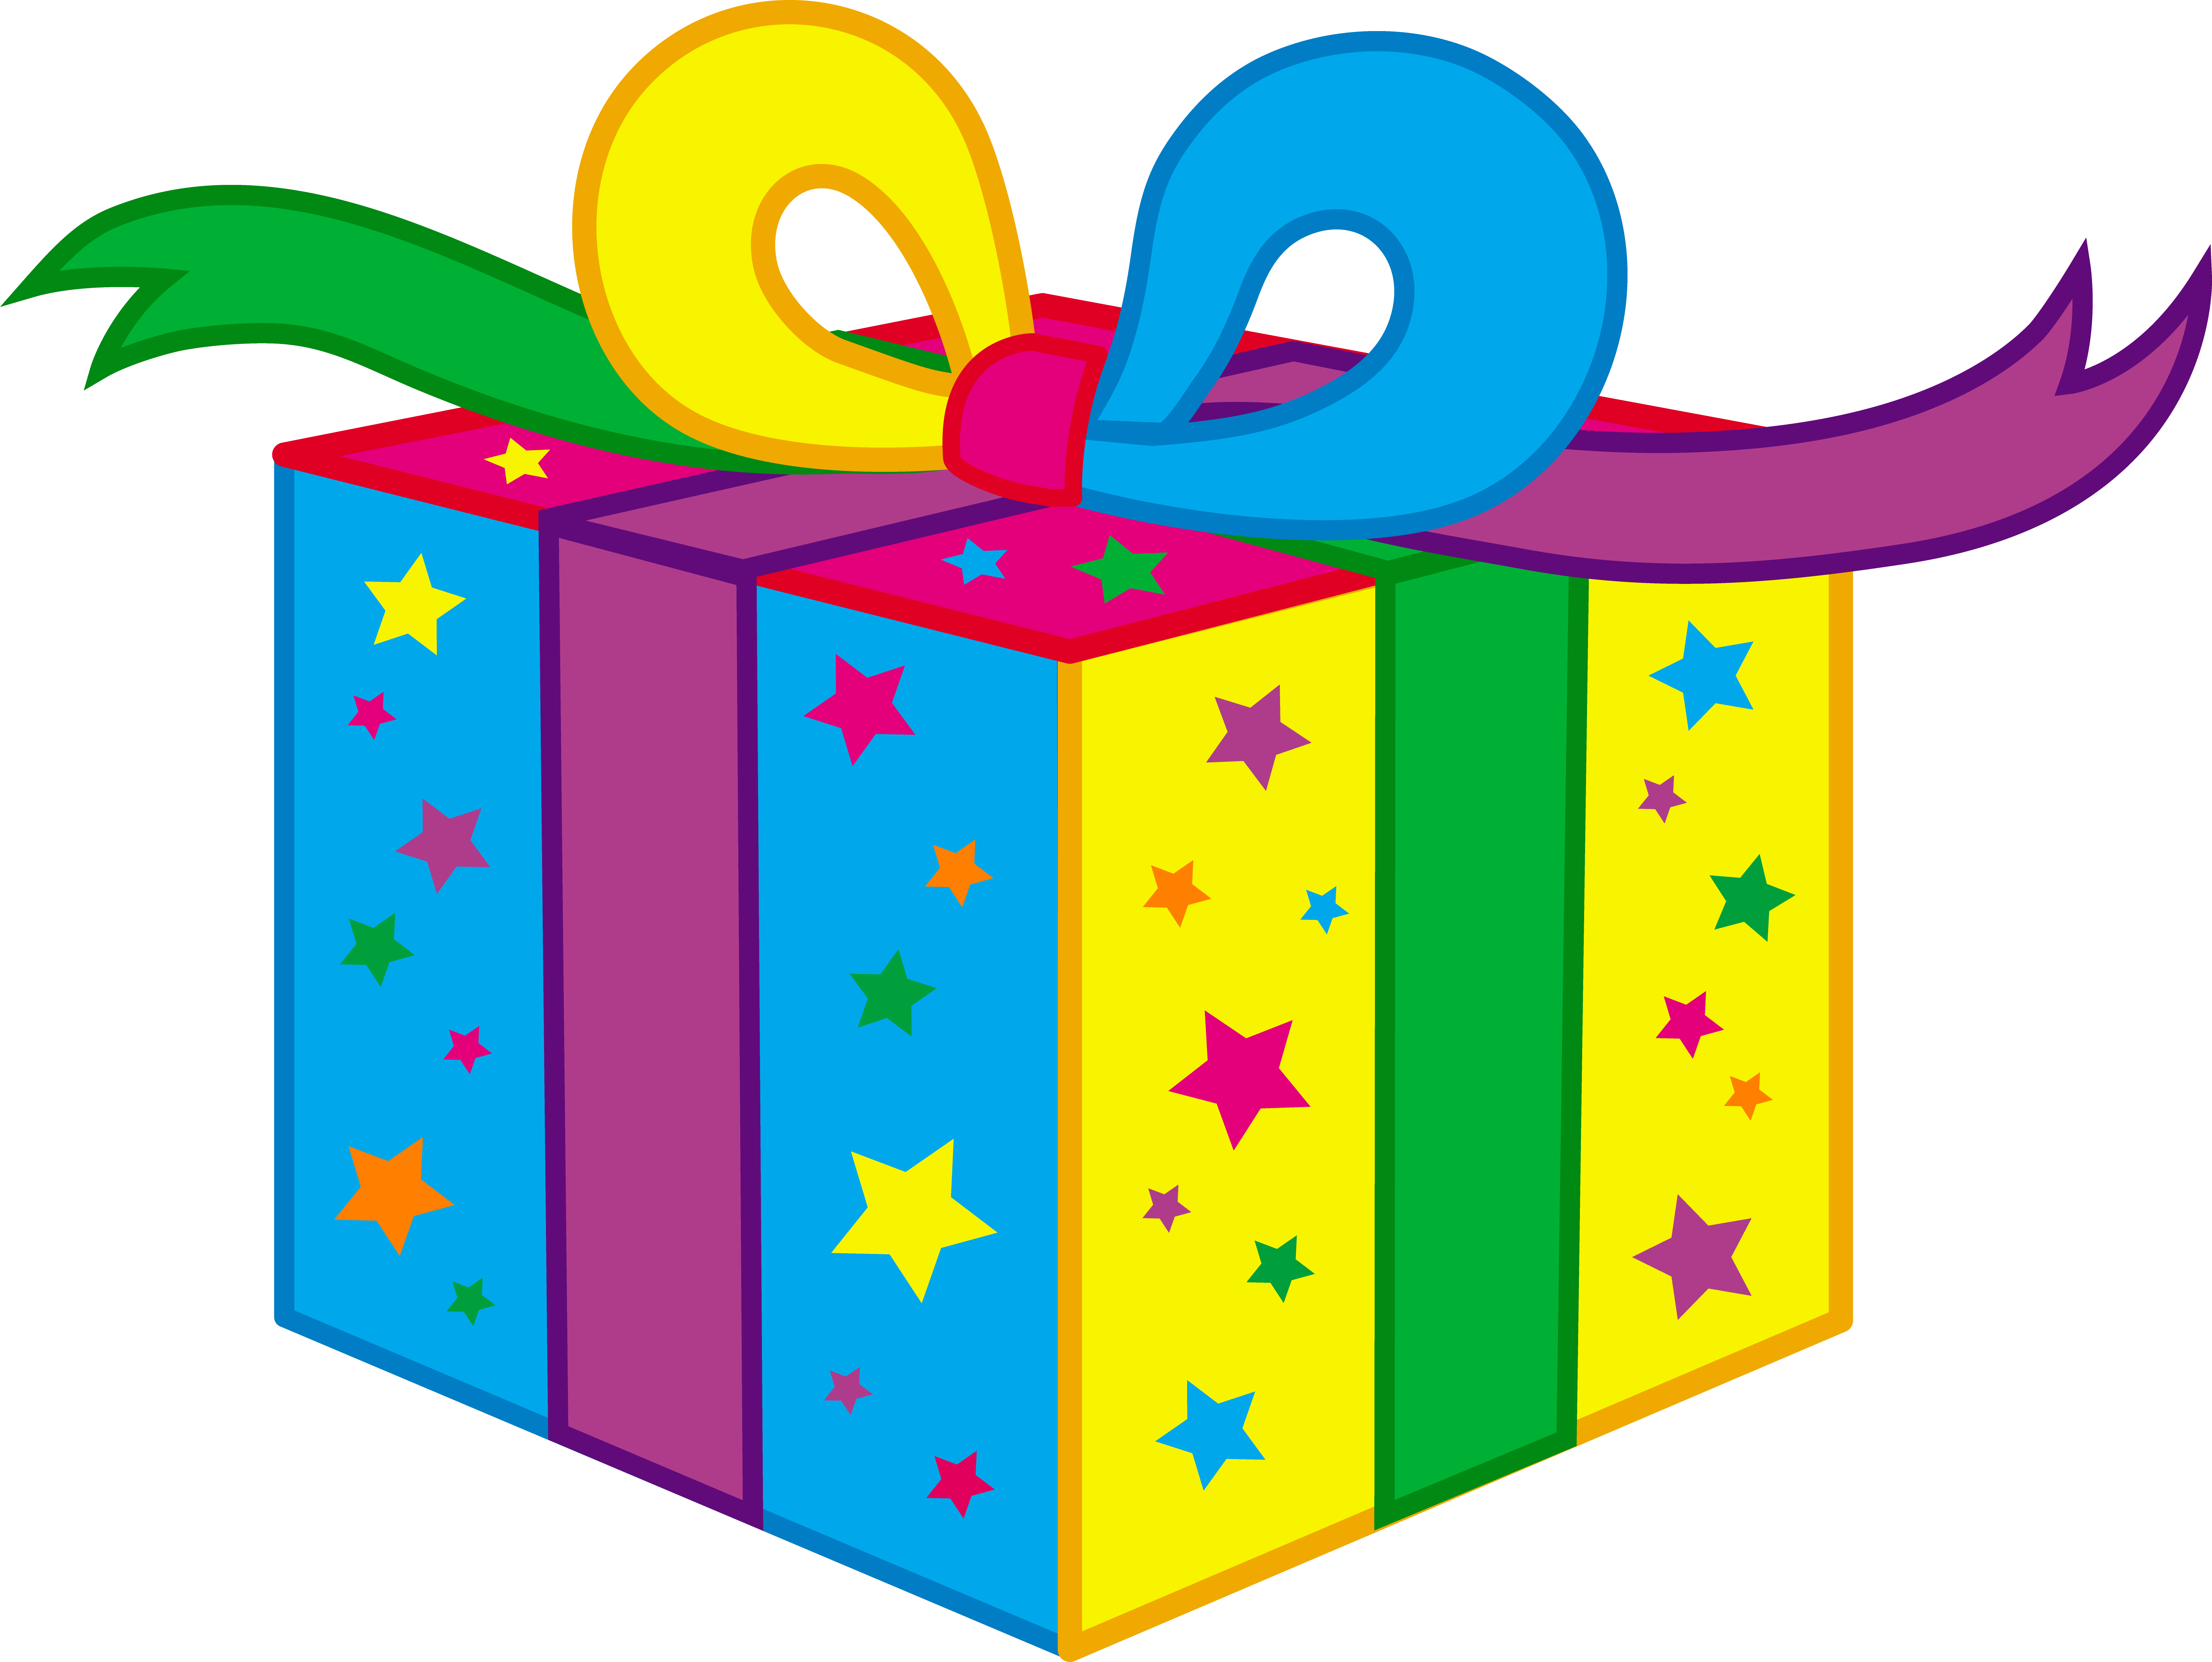 birthday clipart u0026middot; free birthday clipart